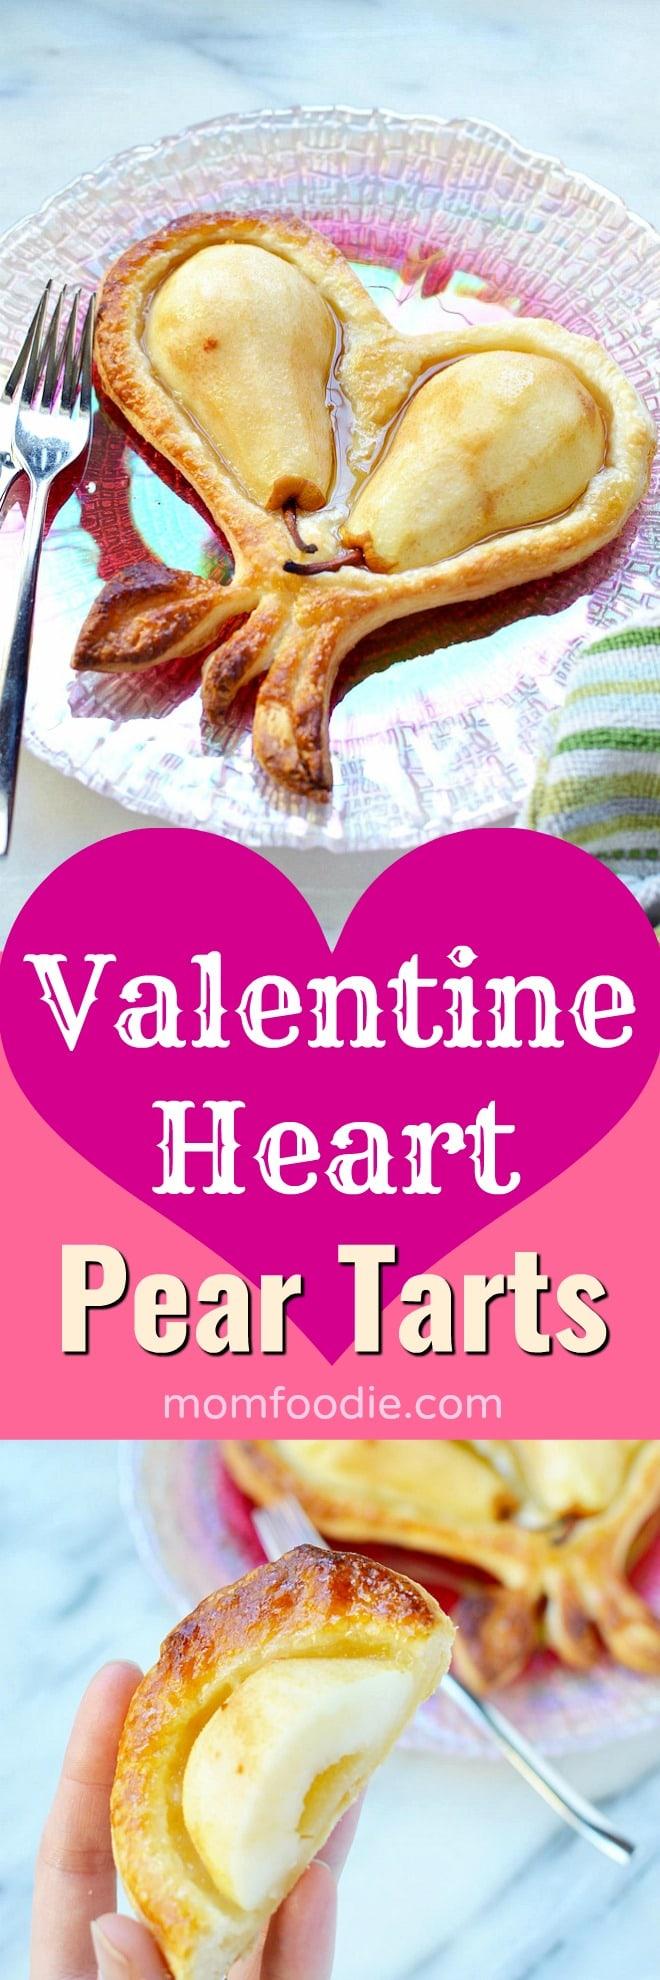 Valentine Heart Pear Tarts